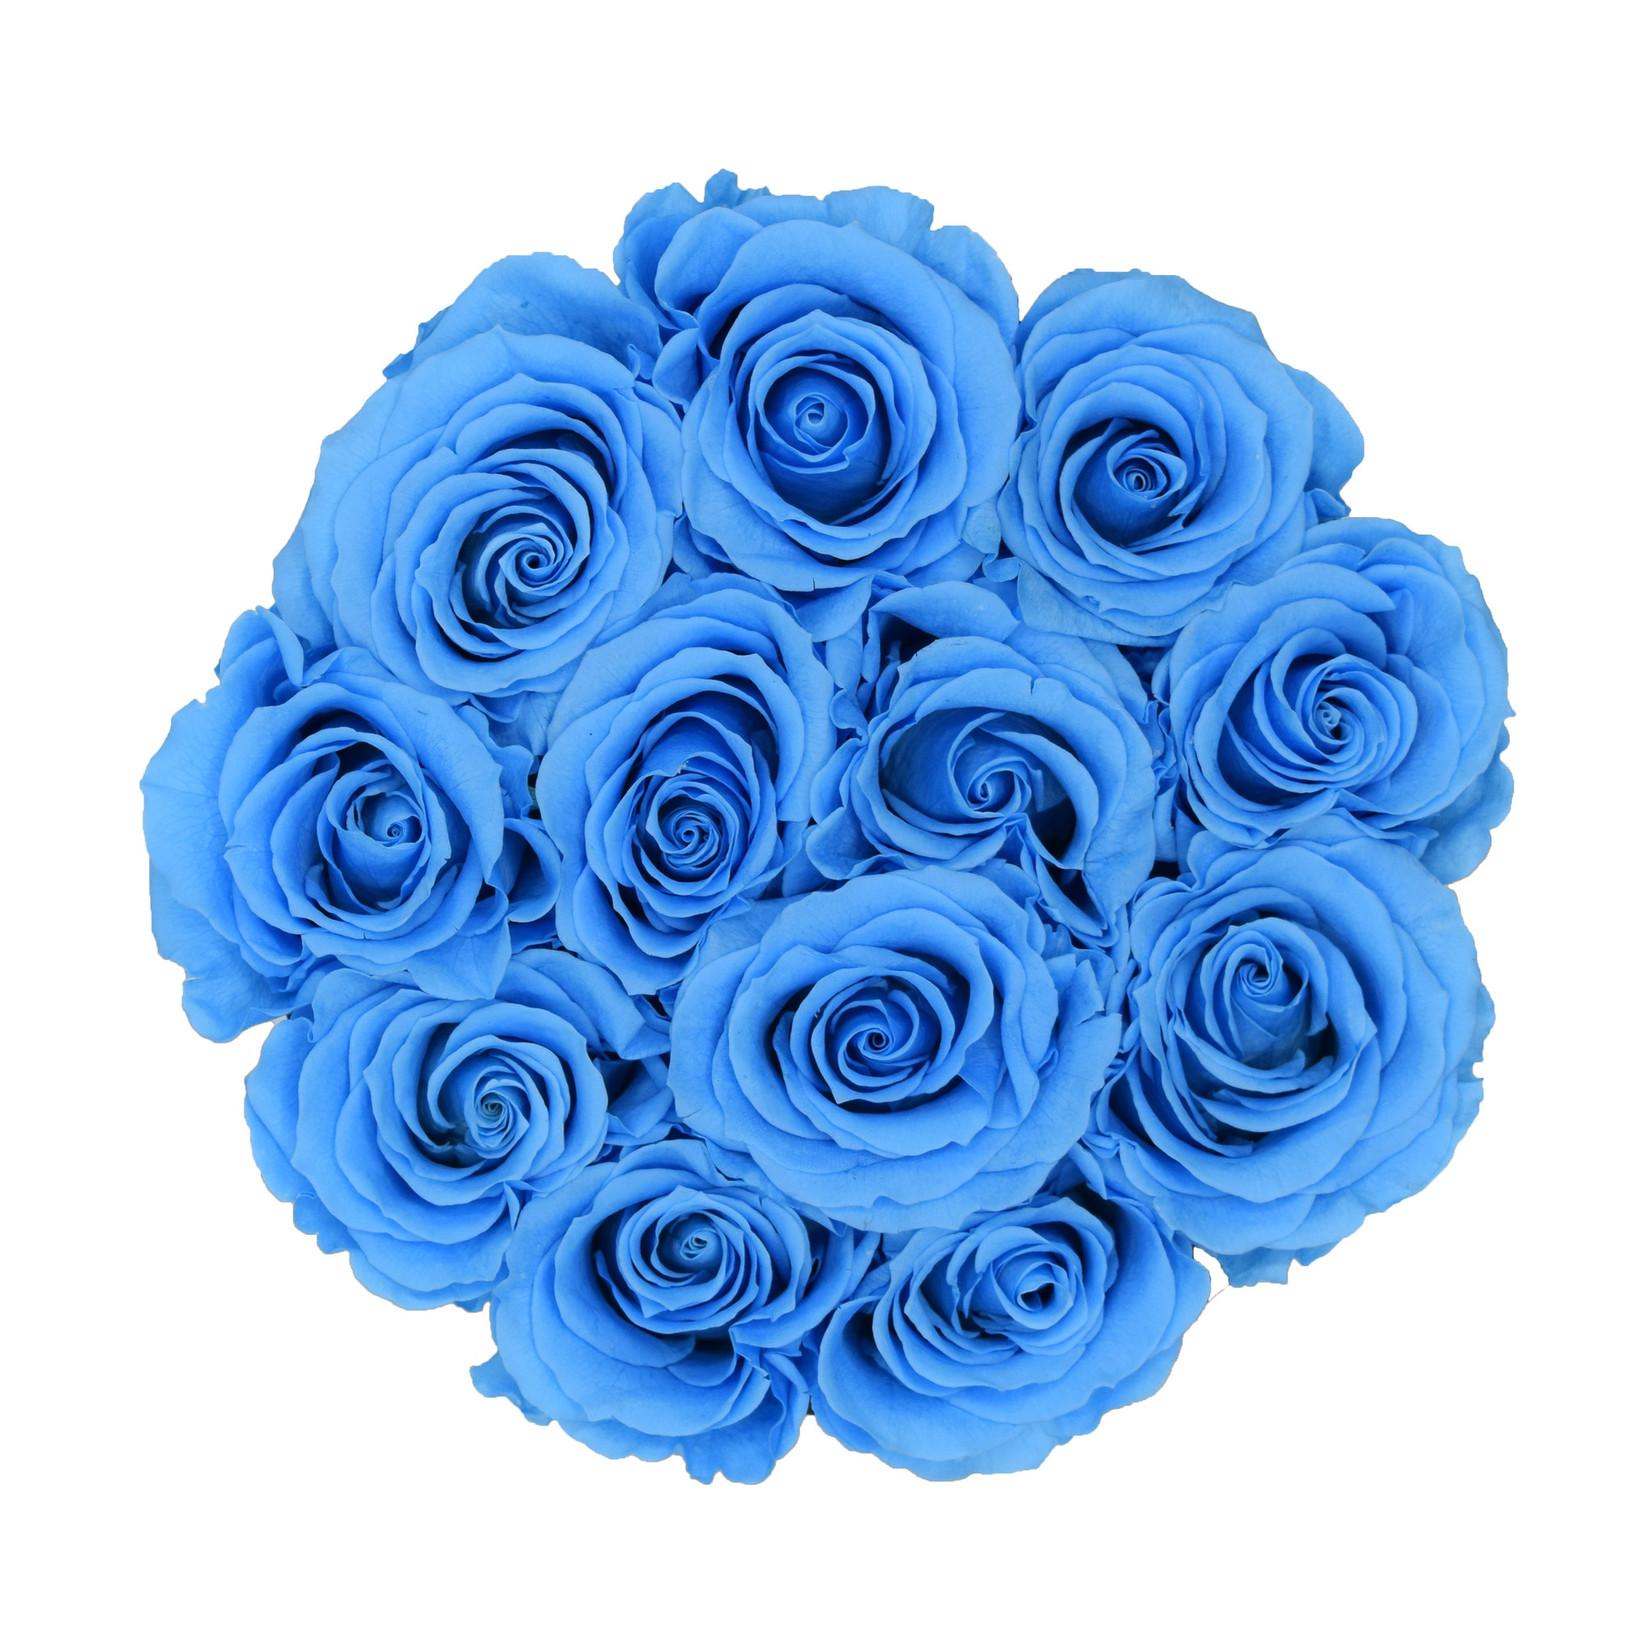 Small - Roses Éternel Bleu - Boîte Blanche